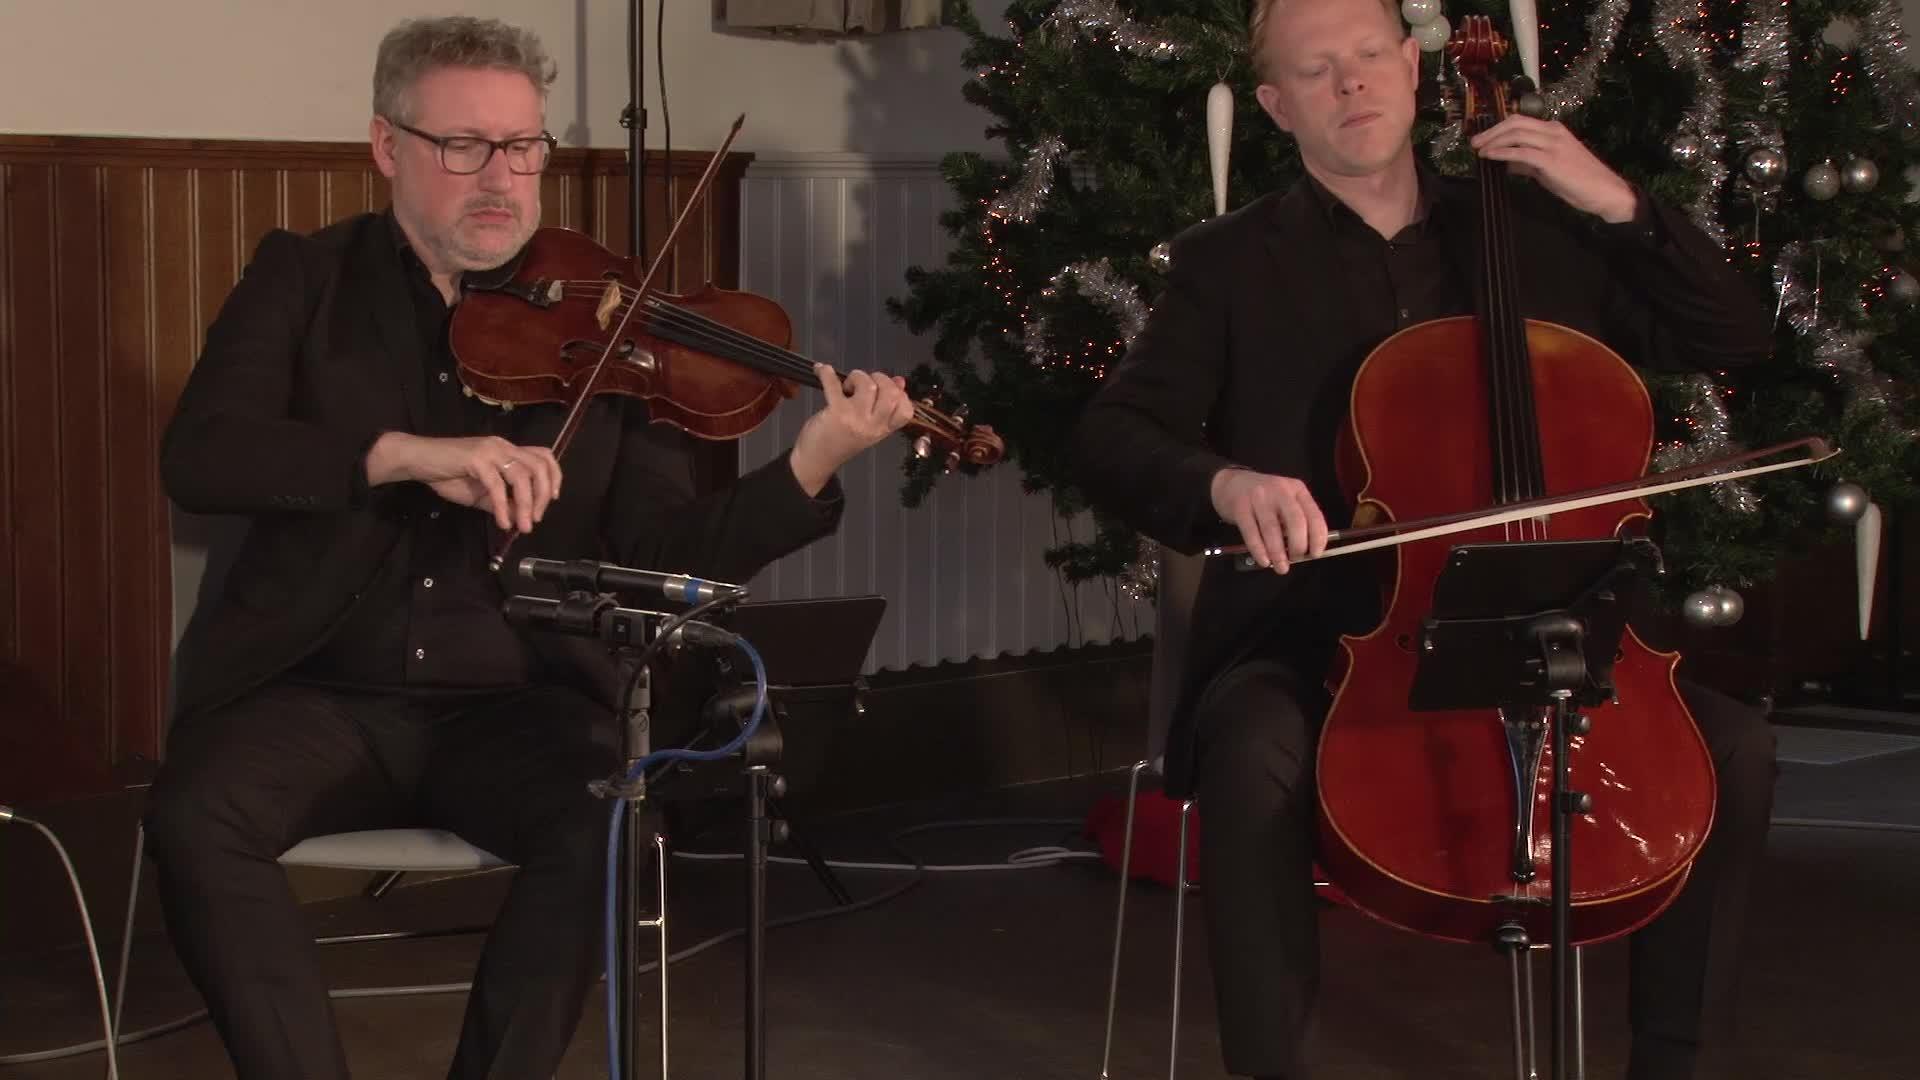 Nieuwjaarsconcert Hummelo 2021: Matangi Quartet en Carel Kraayenhof